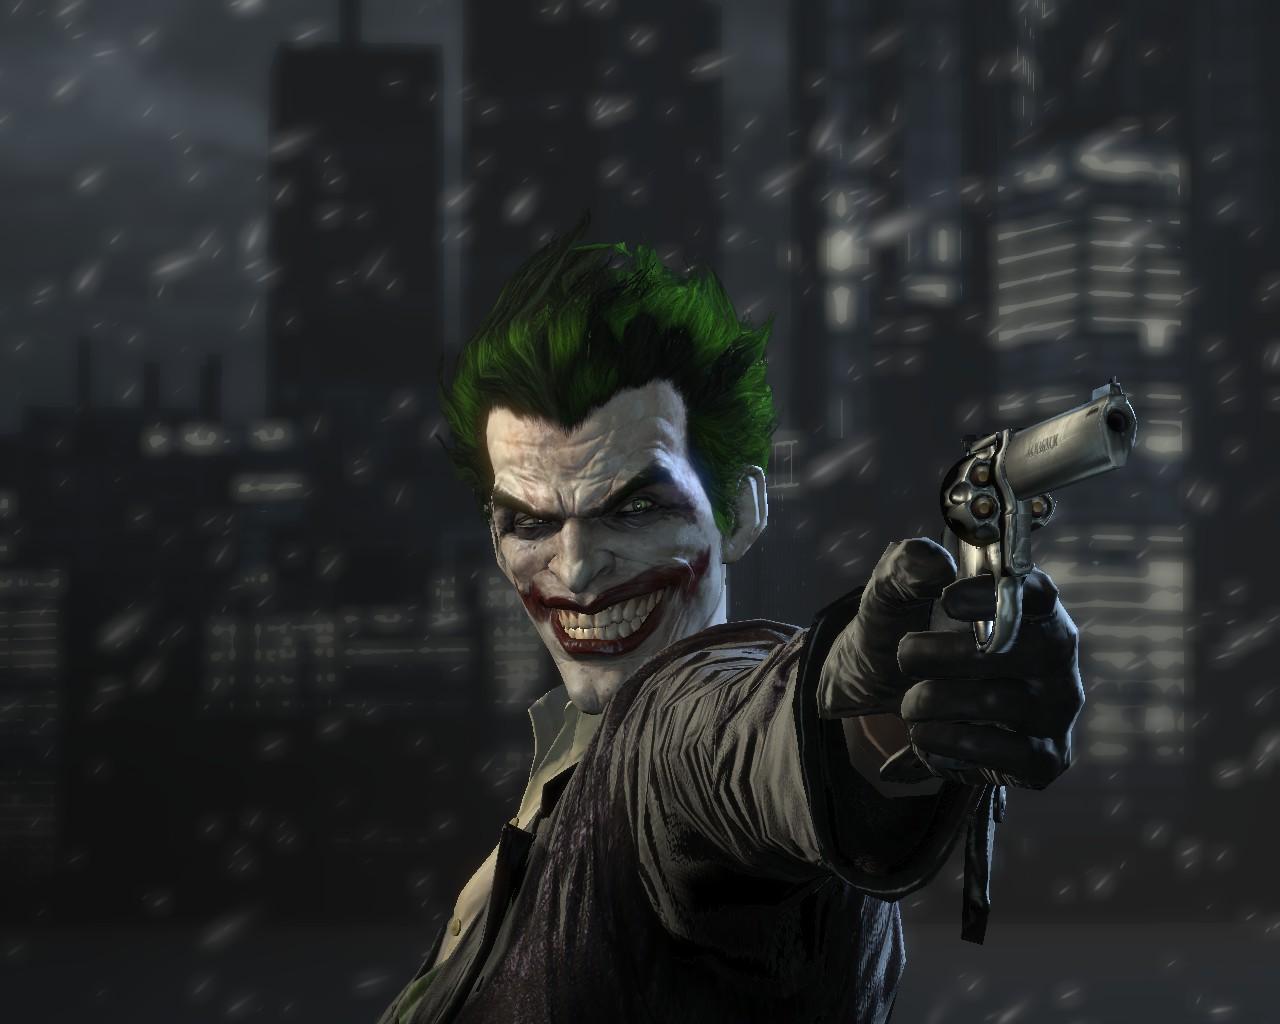 The joker arkham wiki fandom powered by wikia voltagebd Image collections